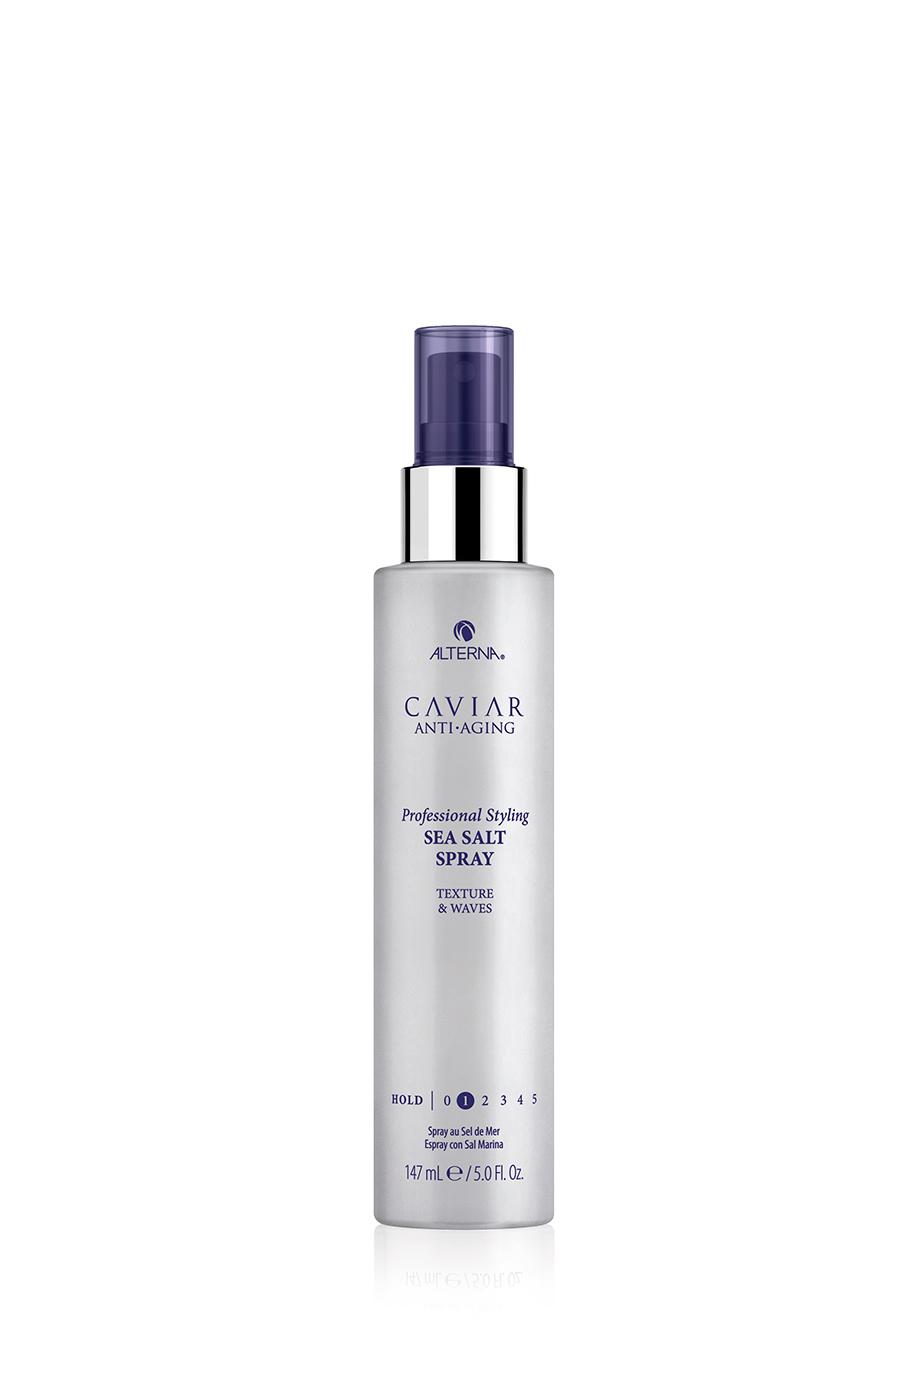 Caviar Anti-Aging Professional Styling Sea Salt Spray Текстурирующий спрей Морская соль с антивозрастным уходом, 147 мл